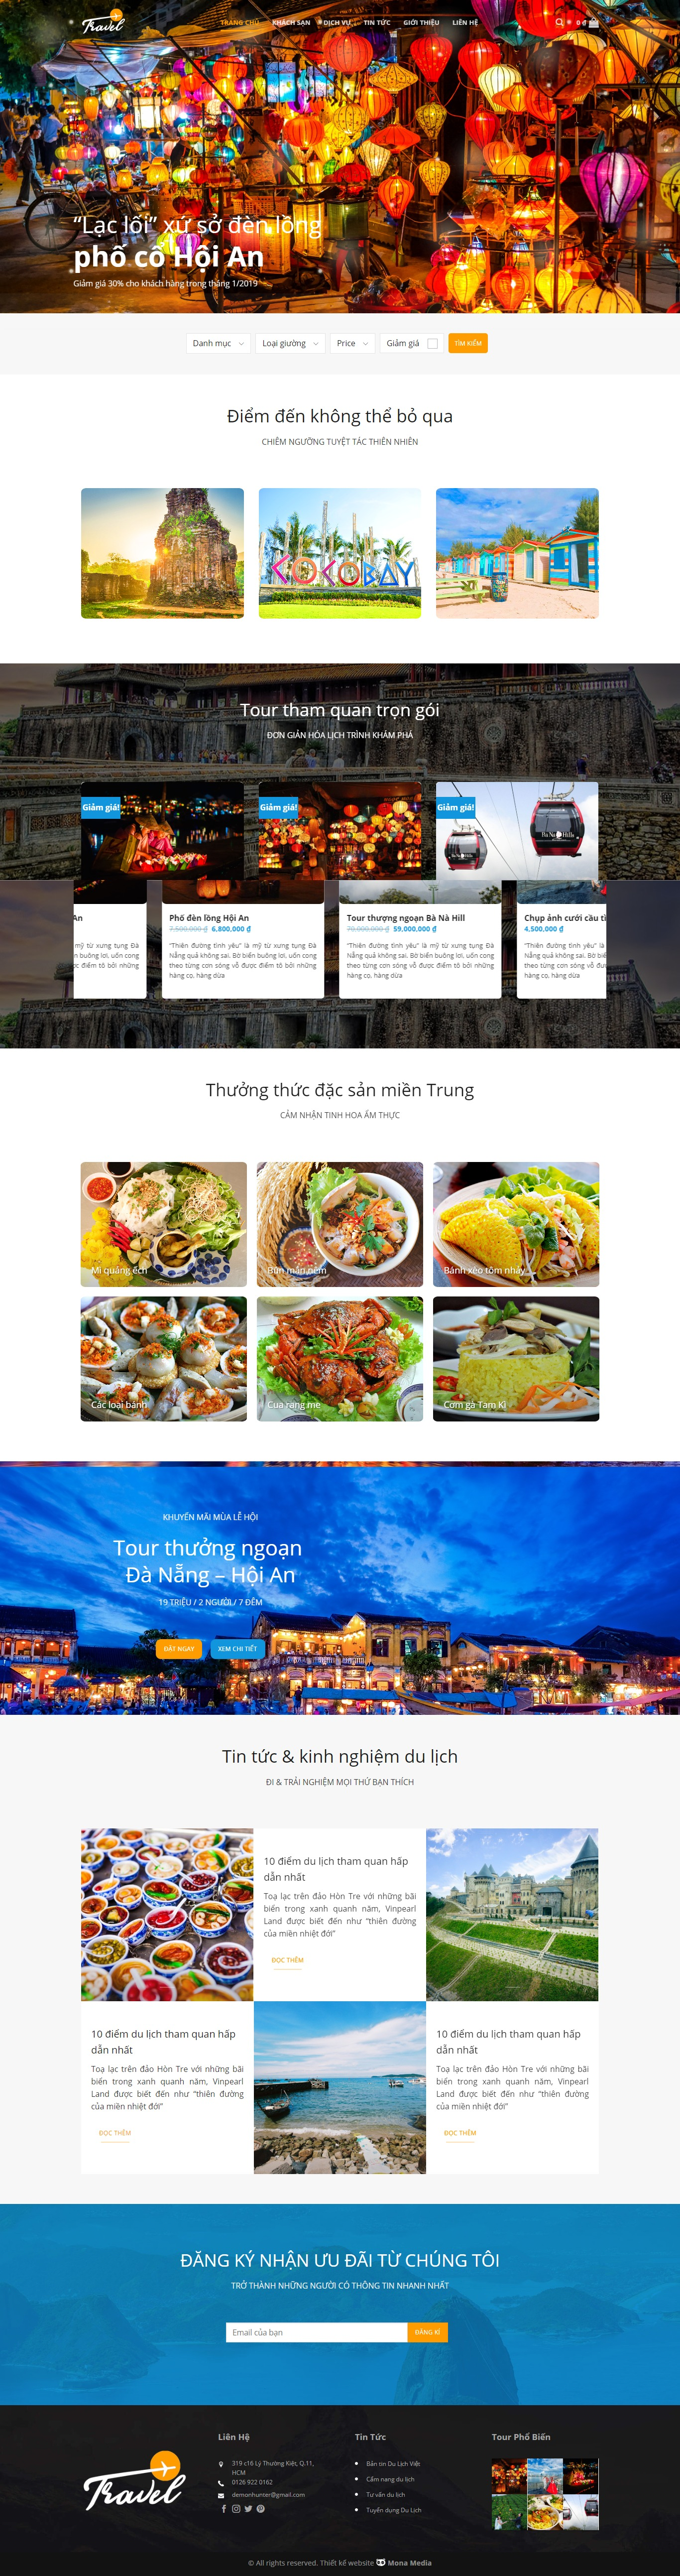 Mẫu website du lịch giống Travelvn